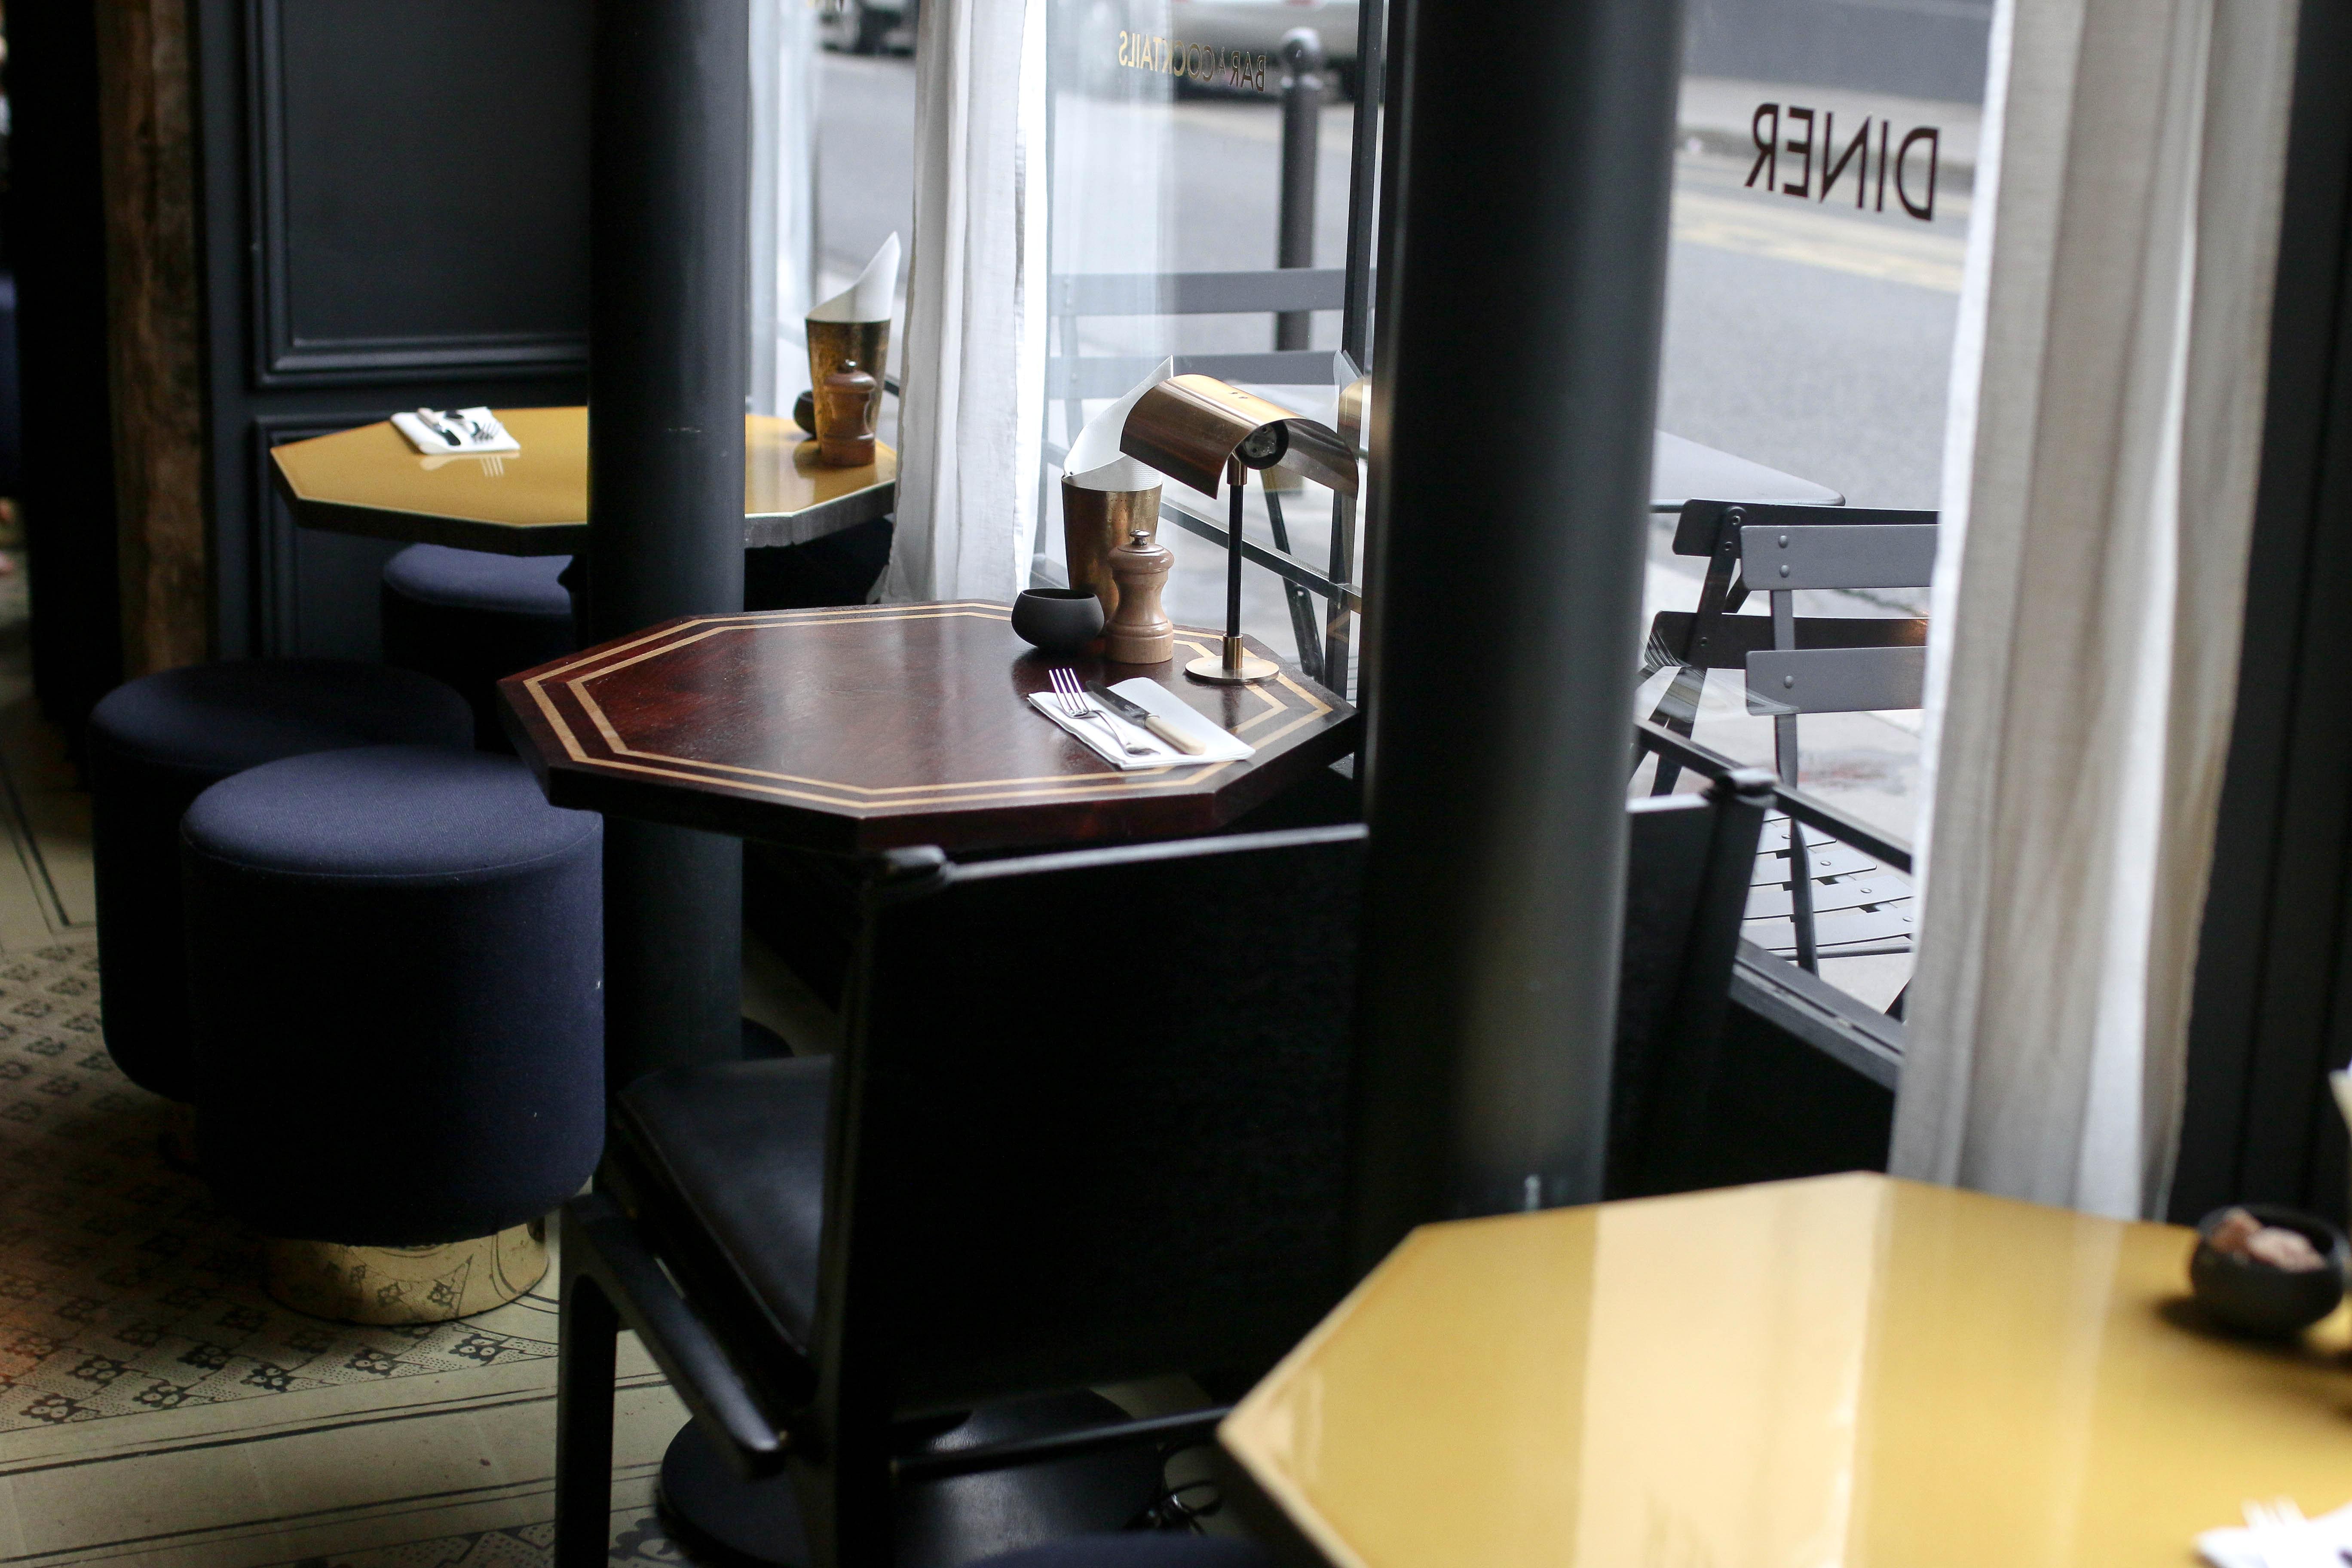 grand pigalle hotel paris breakfast restaurant review